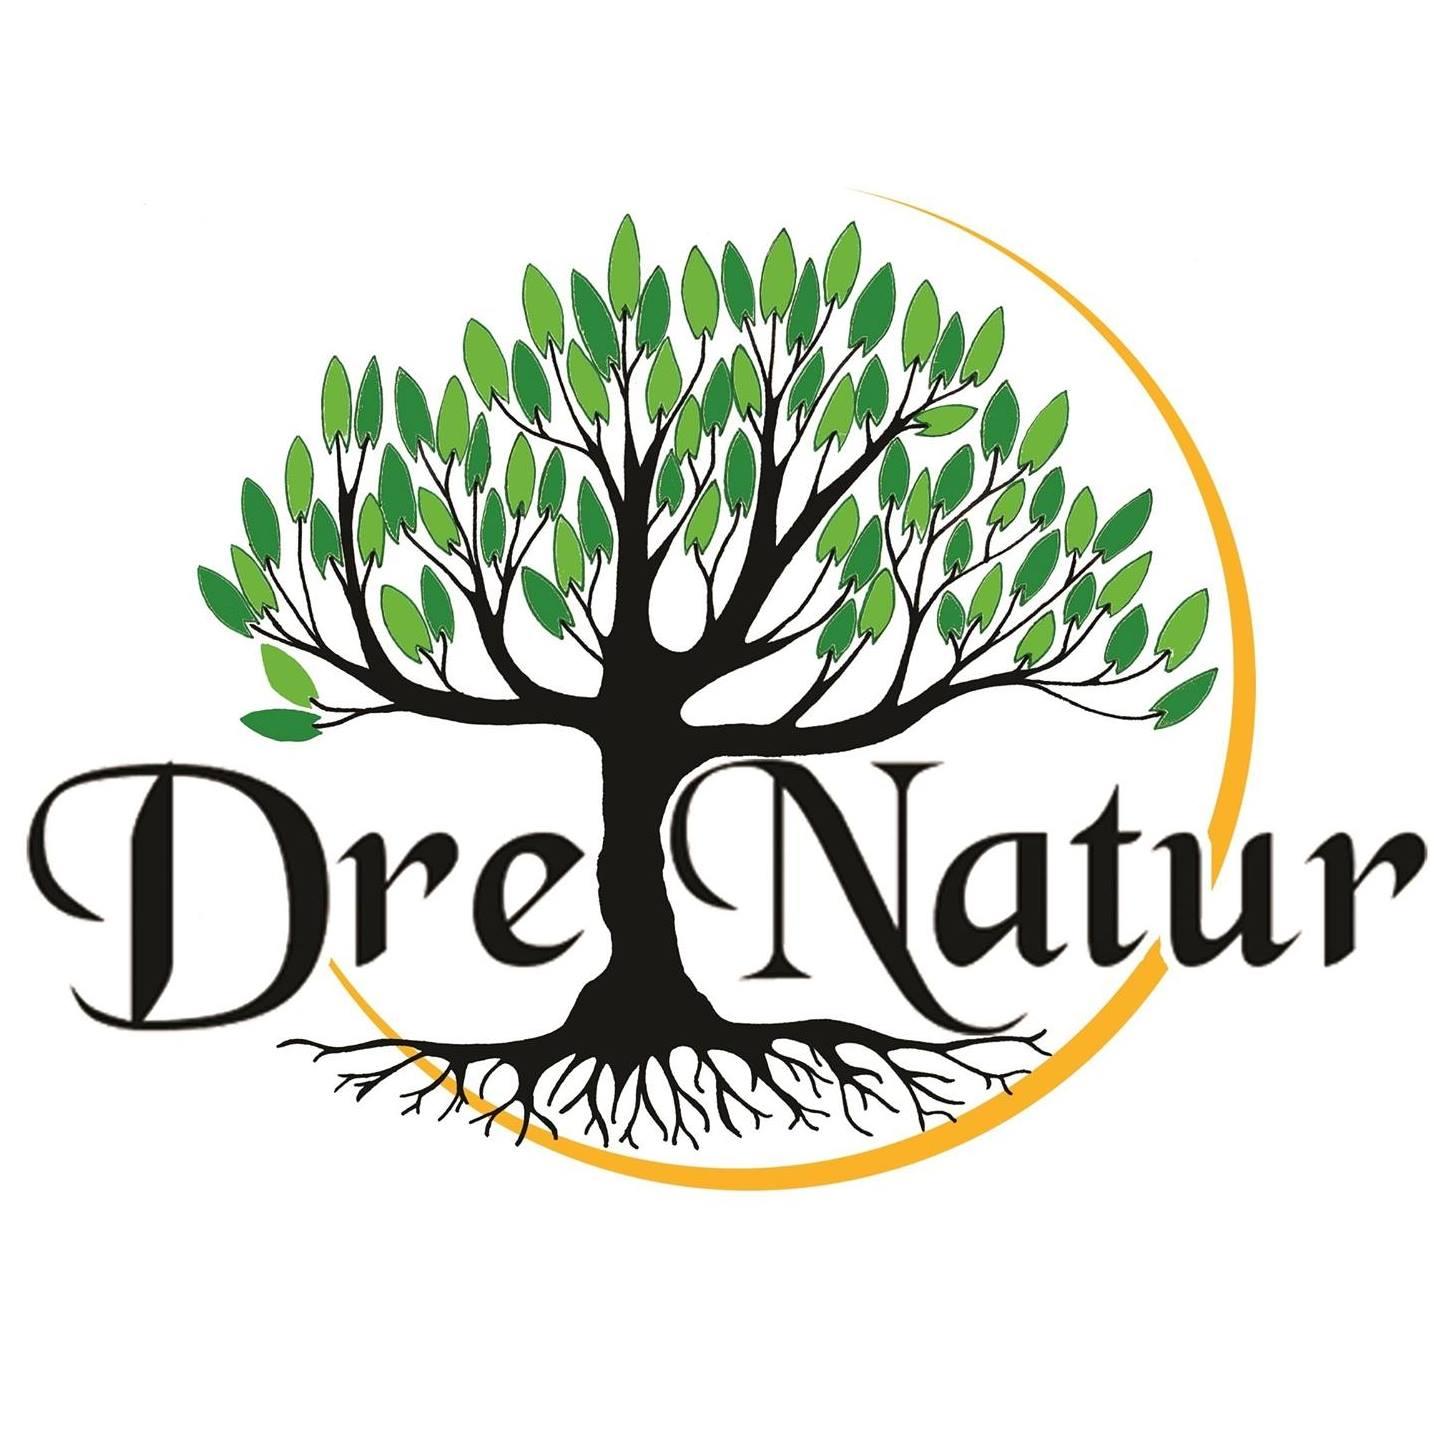 Dre Nature